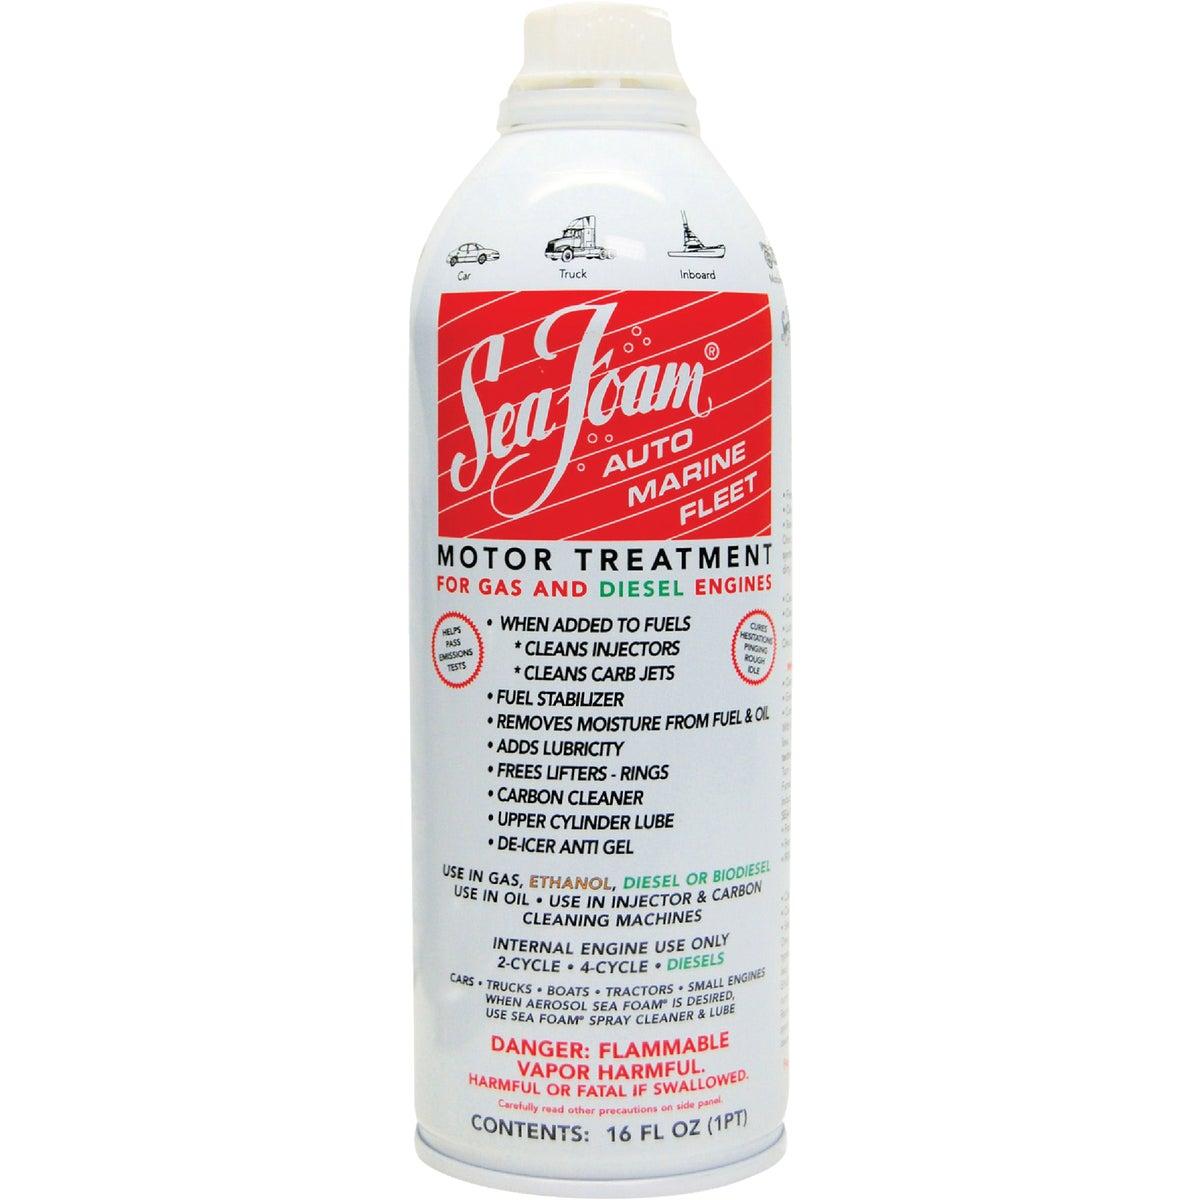 Sea Foam Motor Treatment